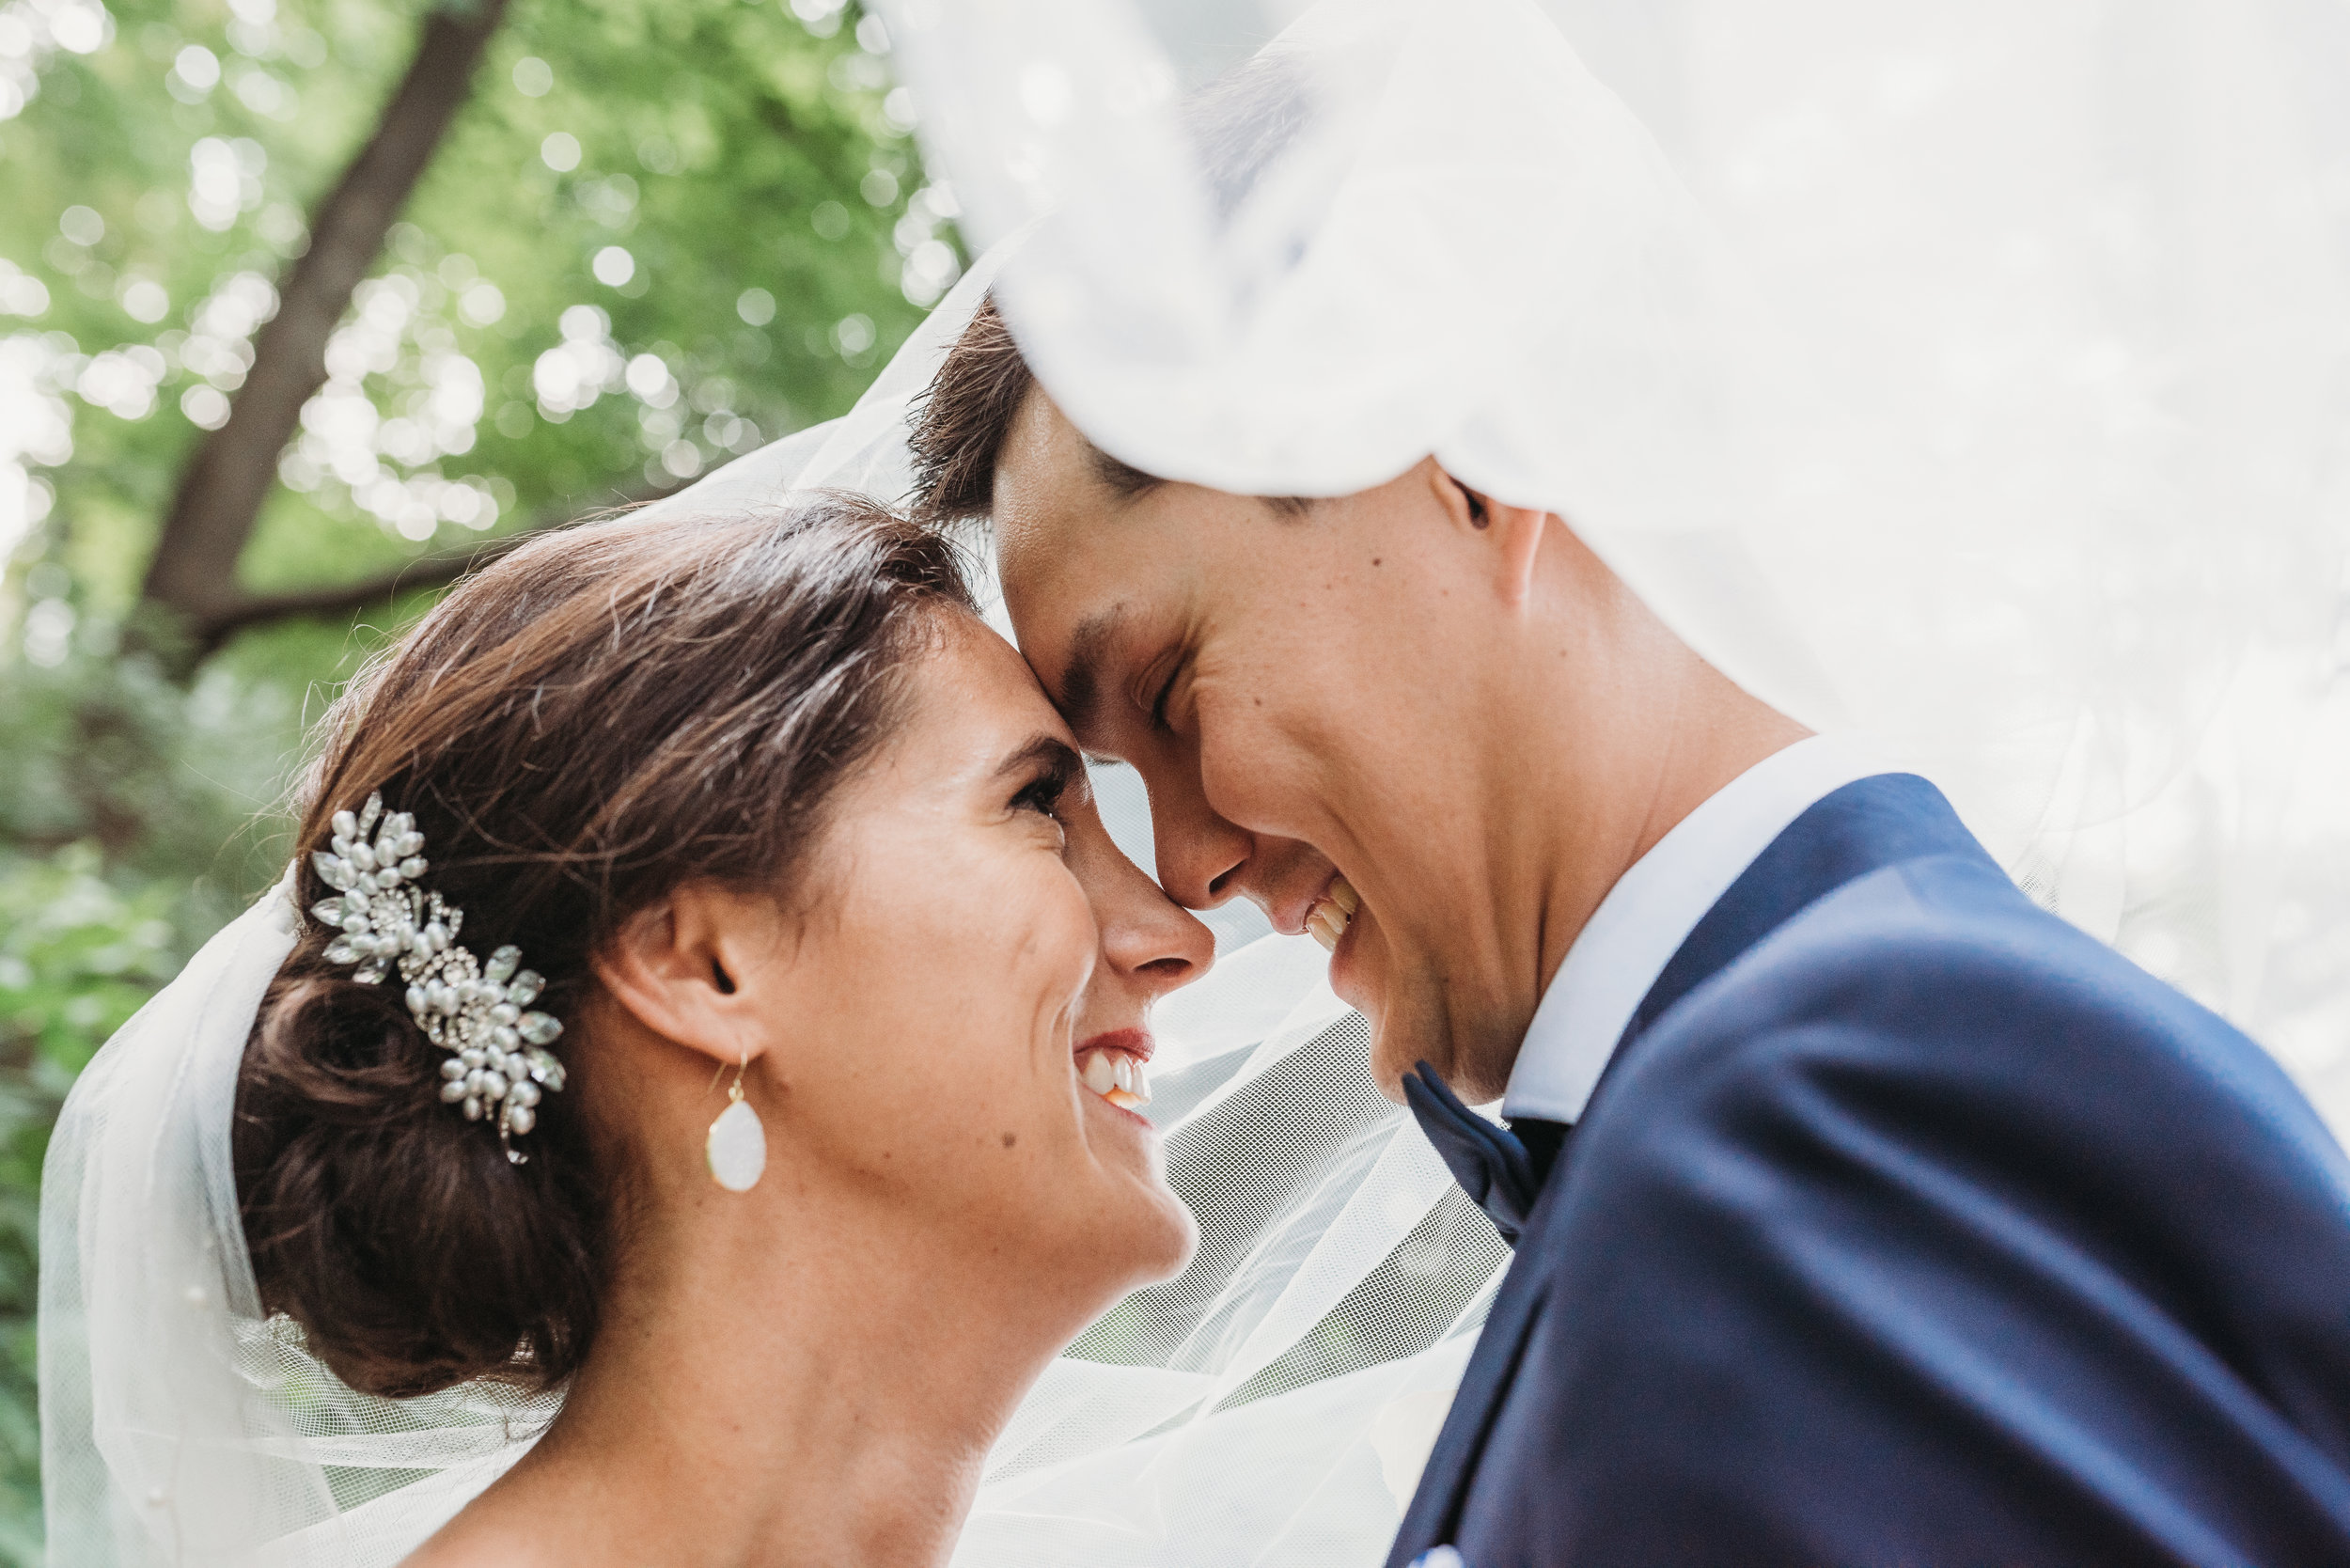 bride-groom-veil-portrait-alexander-muir-memorial-gardens-eglington-grand-wedding-by-willow-birch-photo-toronto-documentary-wedding-photographers.jpg